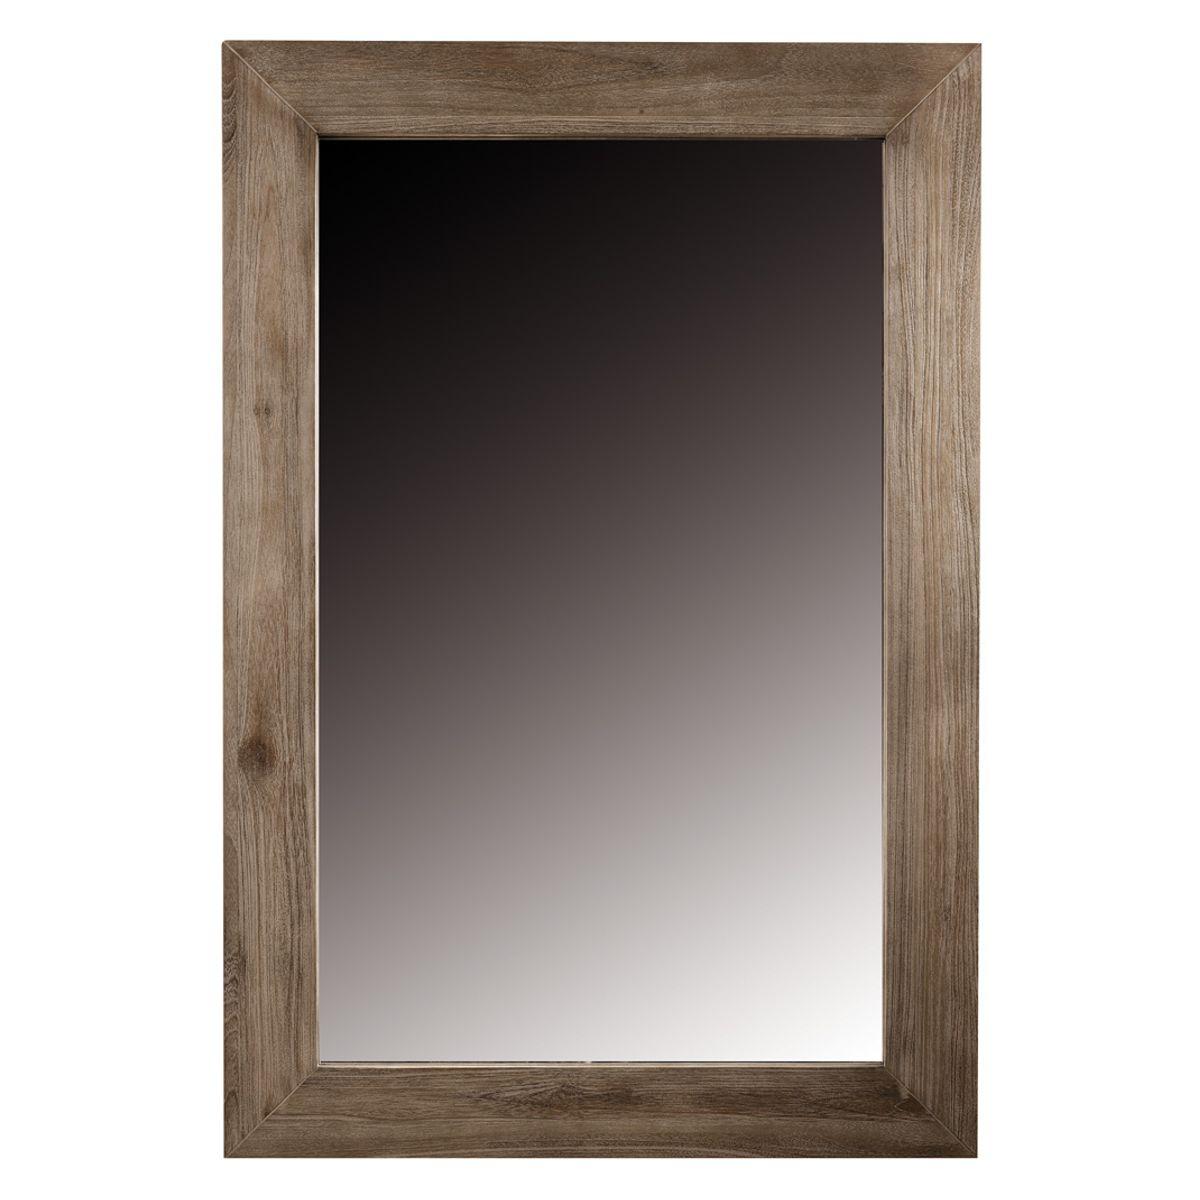 Miroir teck naturel teinté 120 x 80 cm